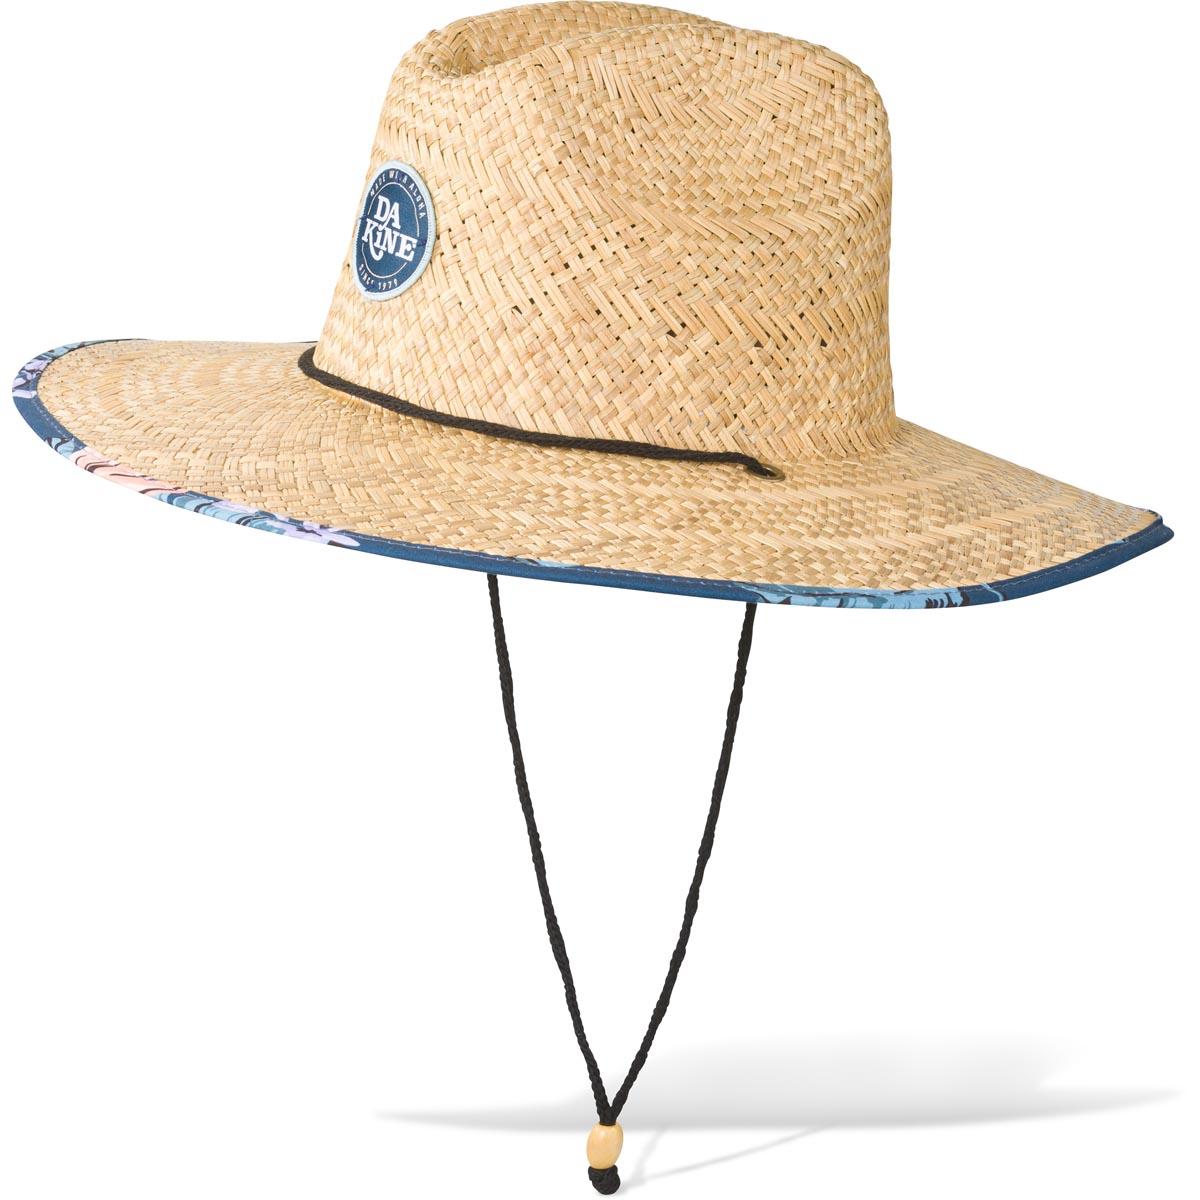 2cb0bef1cc6dd Dakine Pindo Straw Hat Stroh Hut Waimea